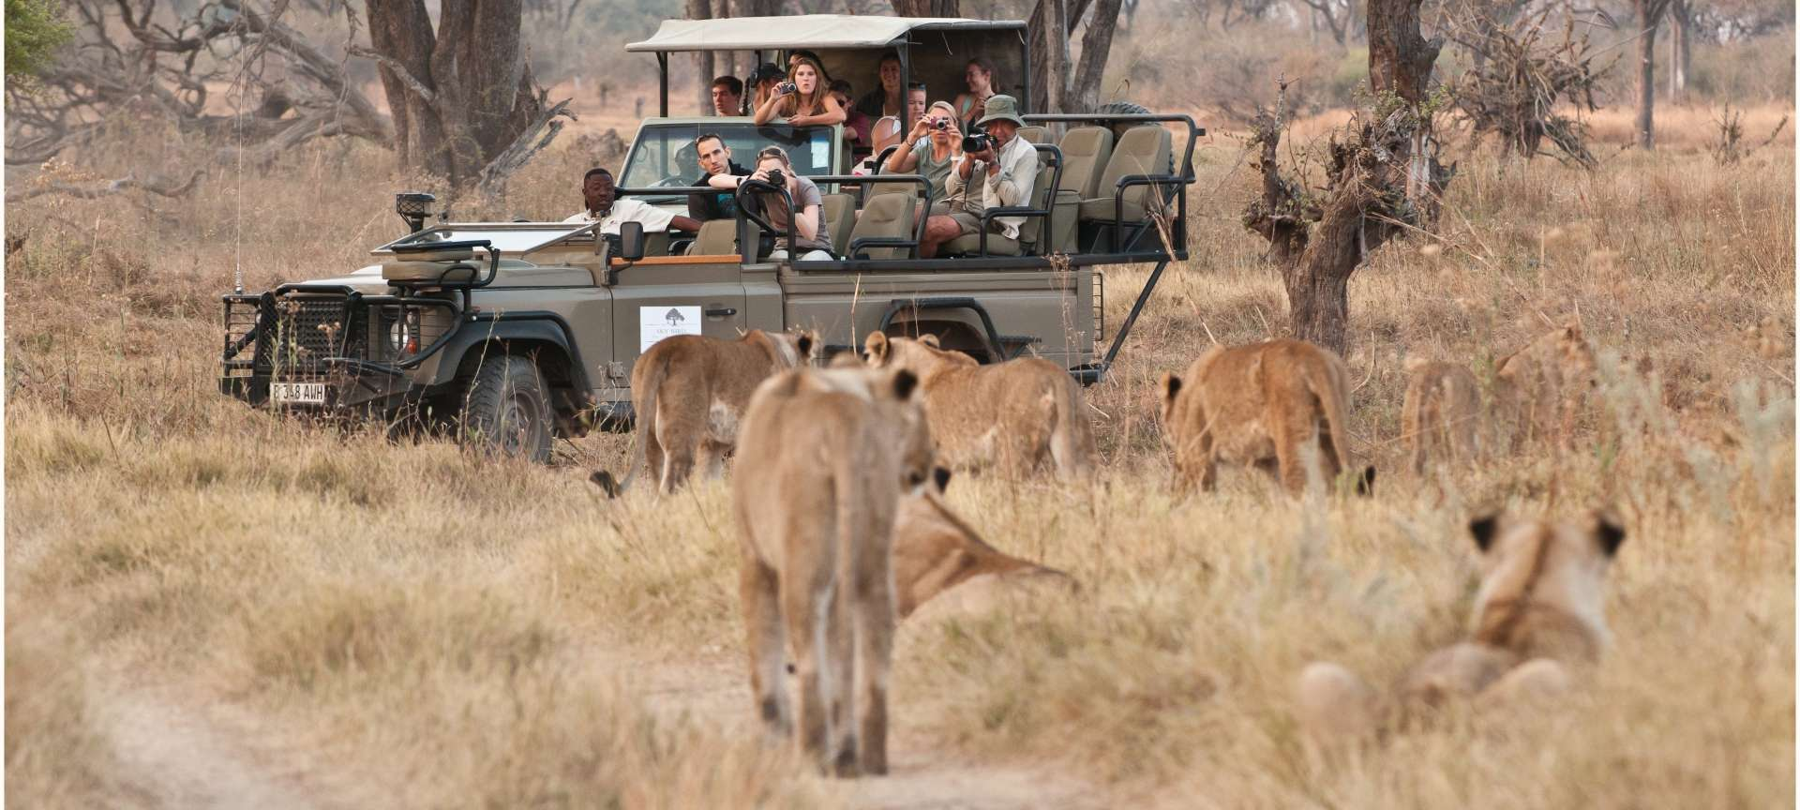 Families can enjoy safaris in Botswana